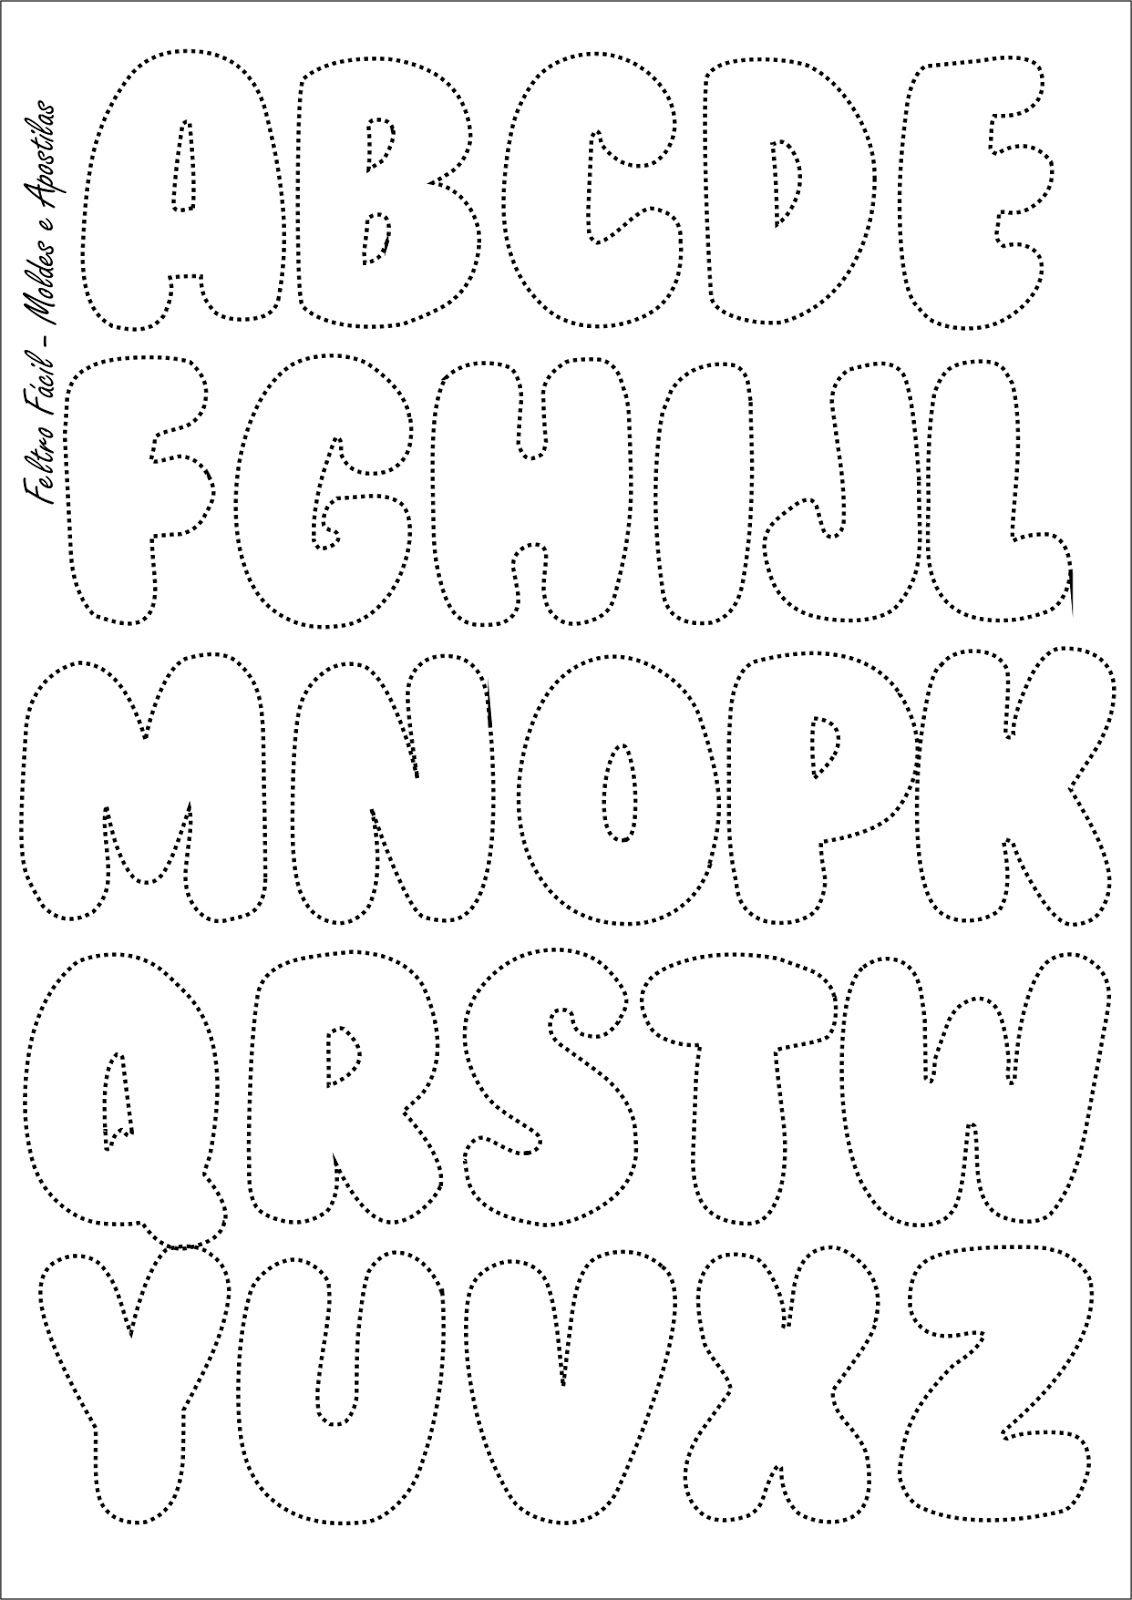 Feltro Fcil Molde Do Alfabeto  Felt Letters Template  Diy